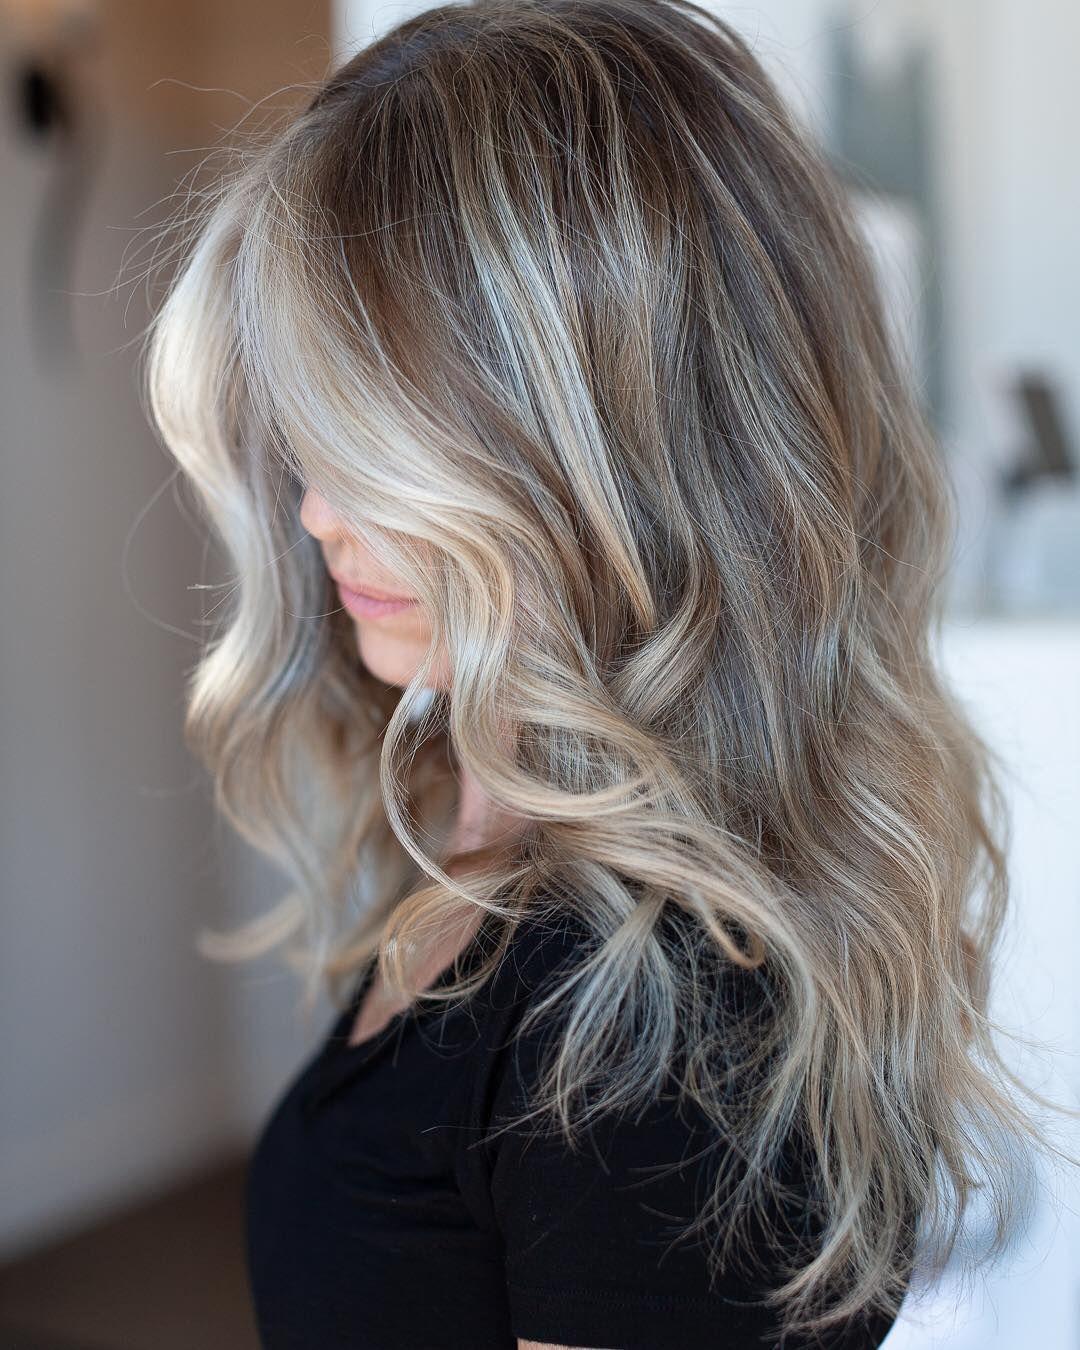 Mushroom blonde is the new trending summer hair co